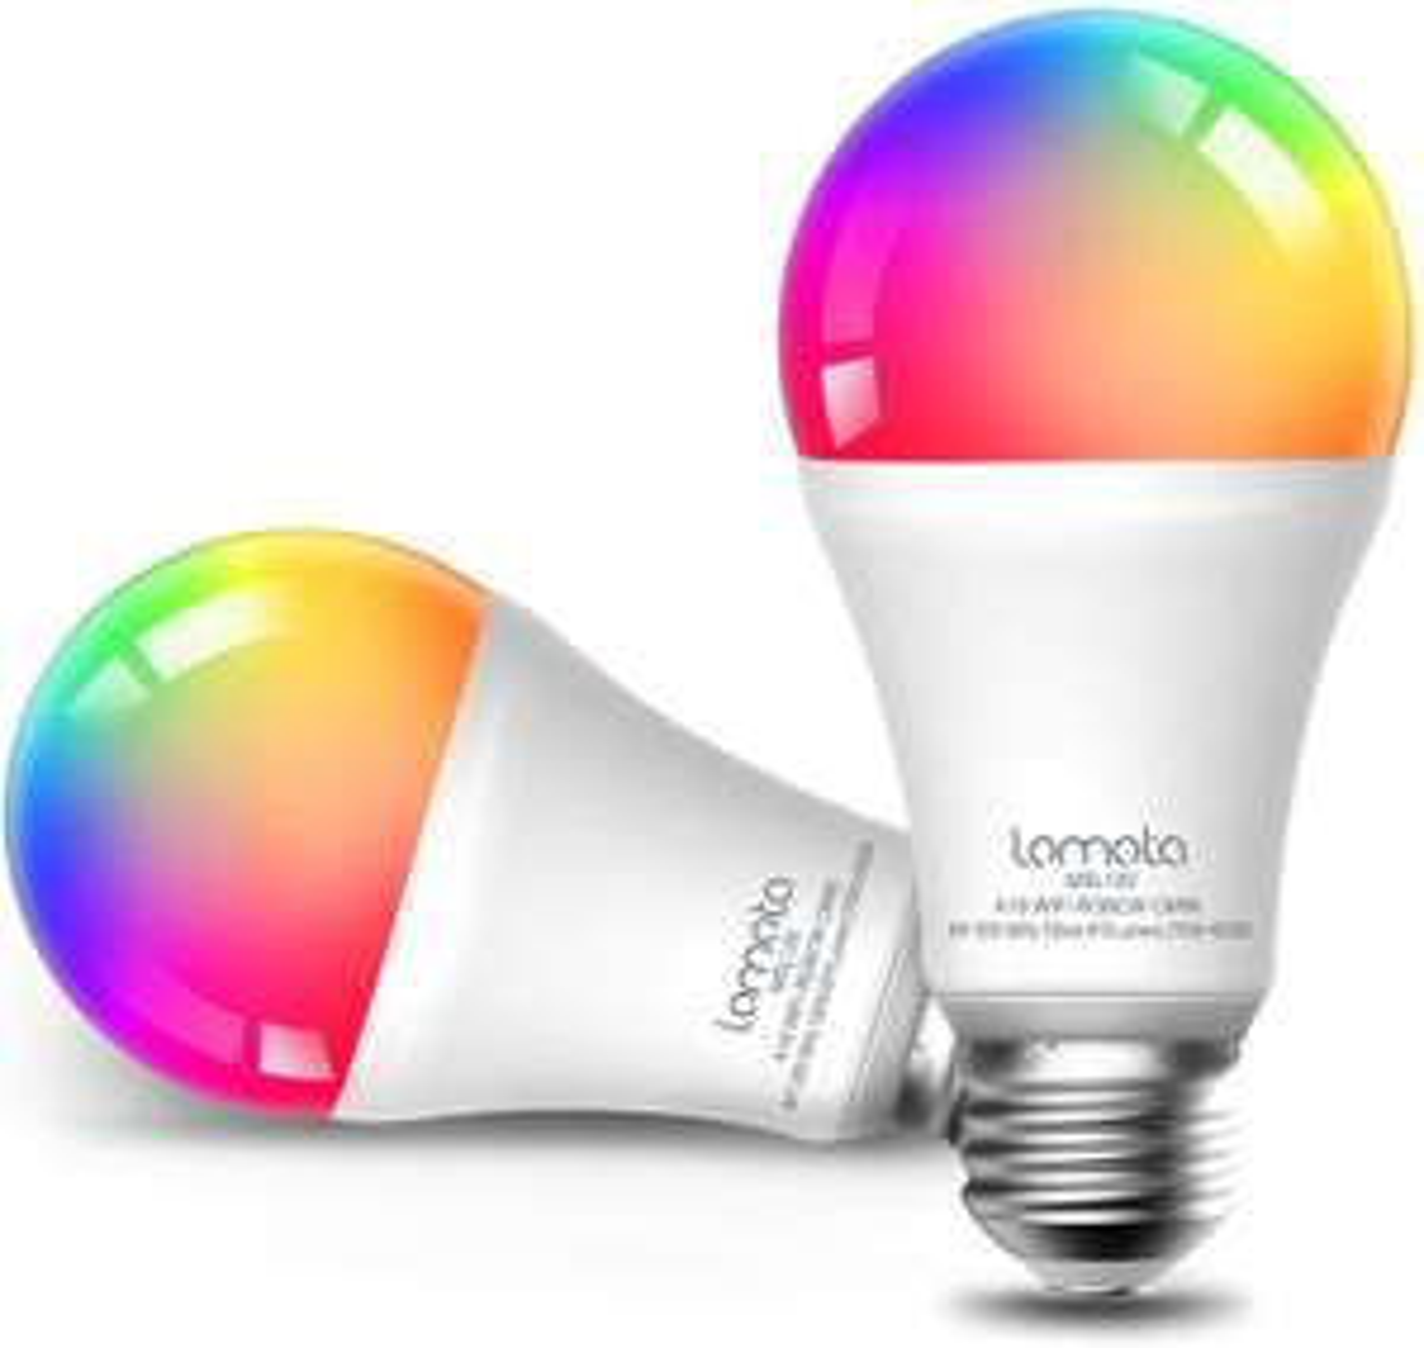 Lomota Smart LED E27 lampen (2 stuks) voor €11,99 @ Amazon.nl